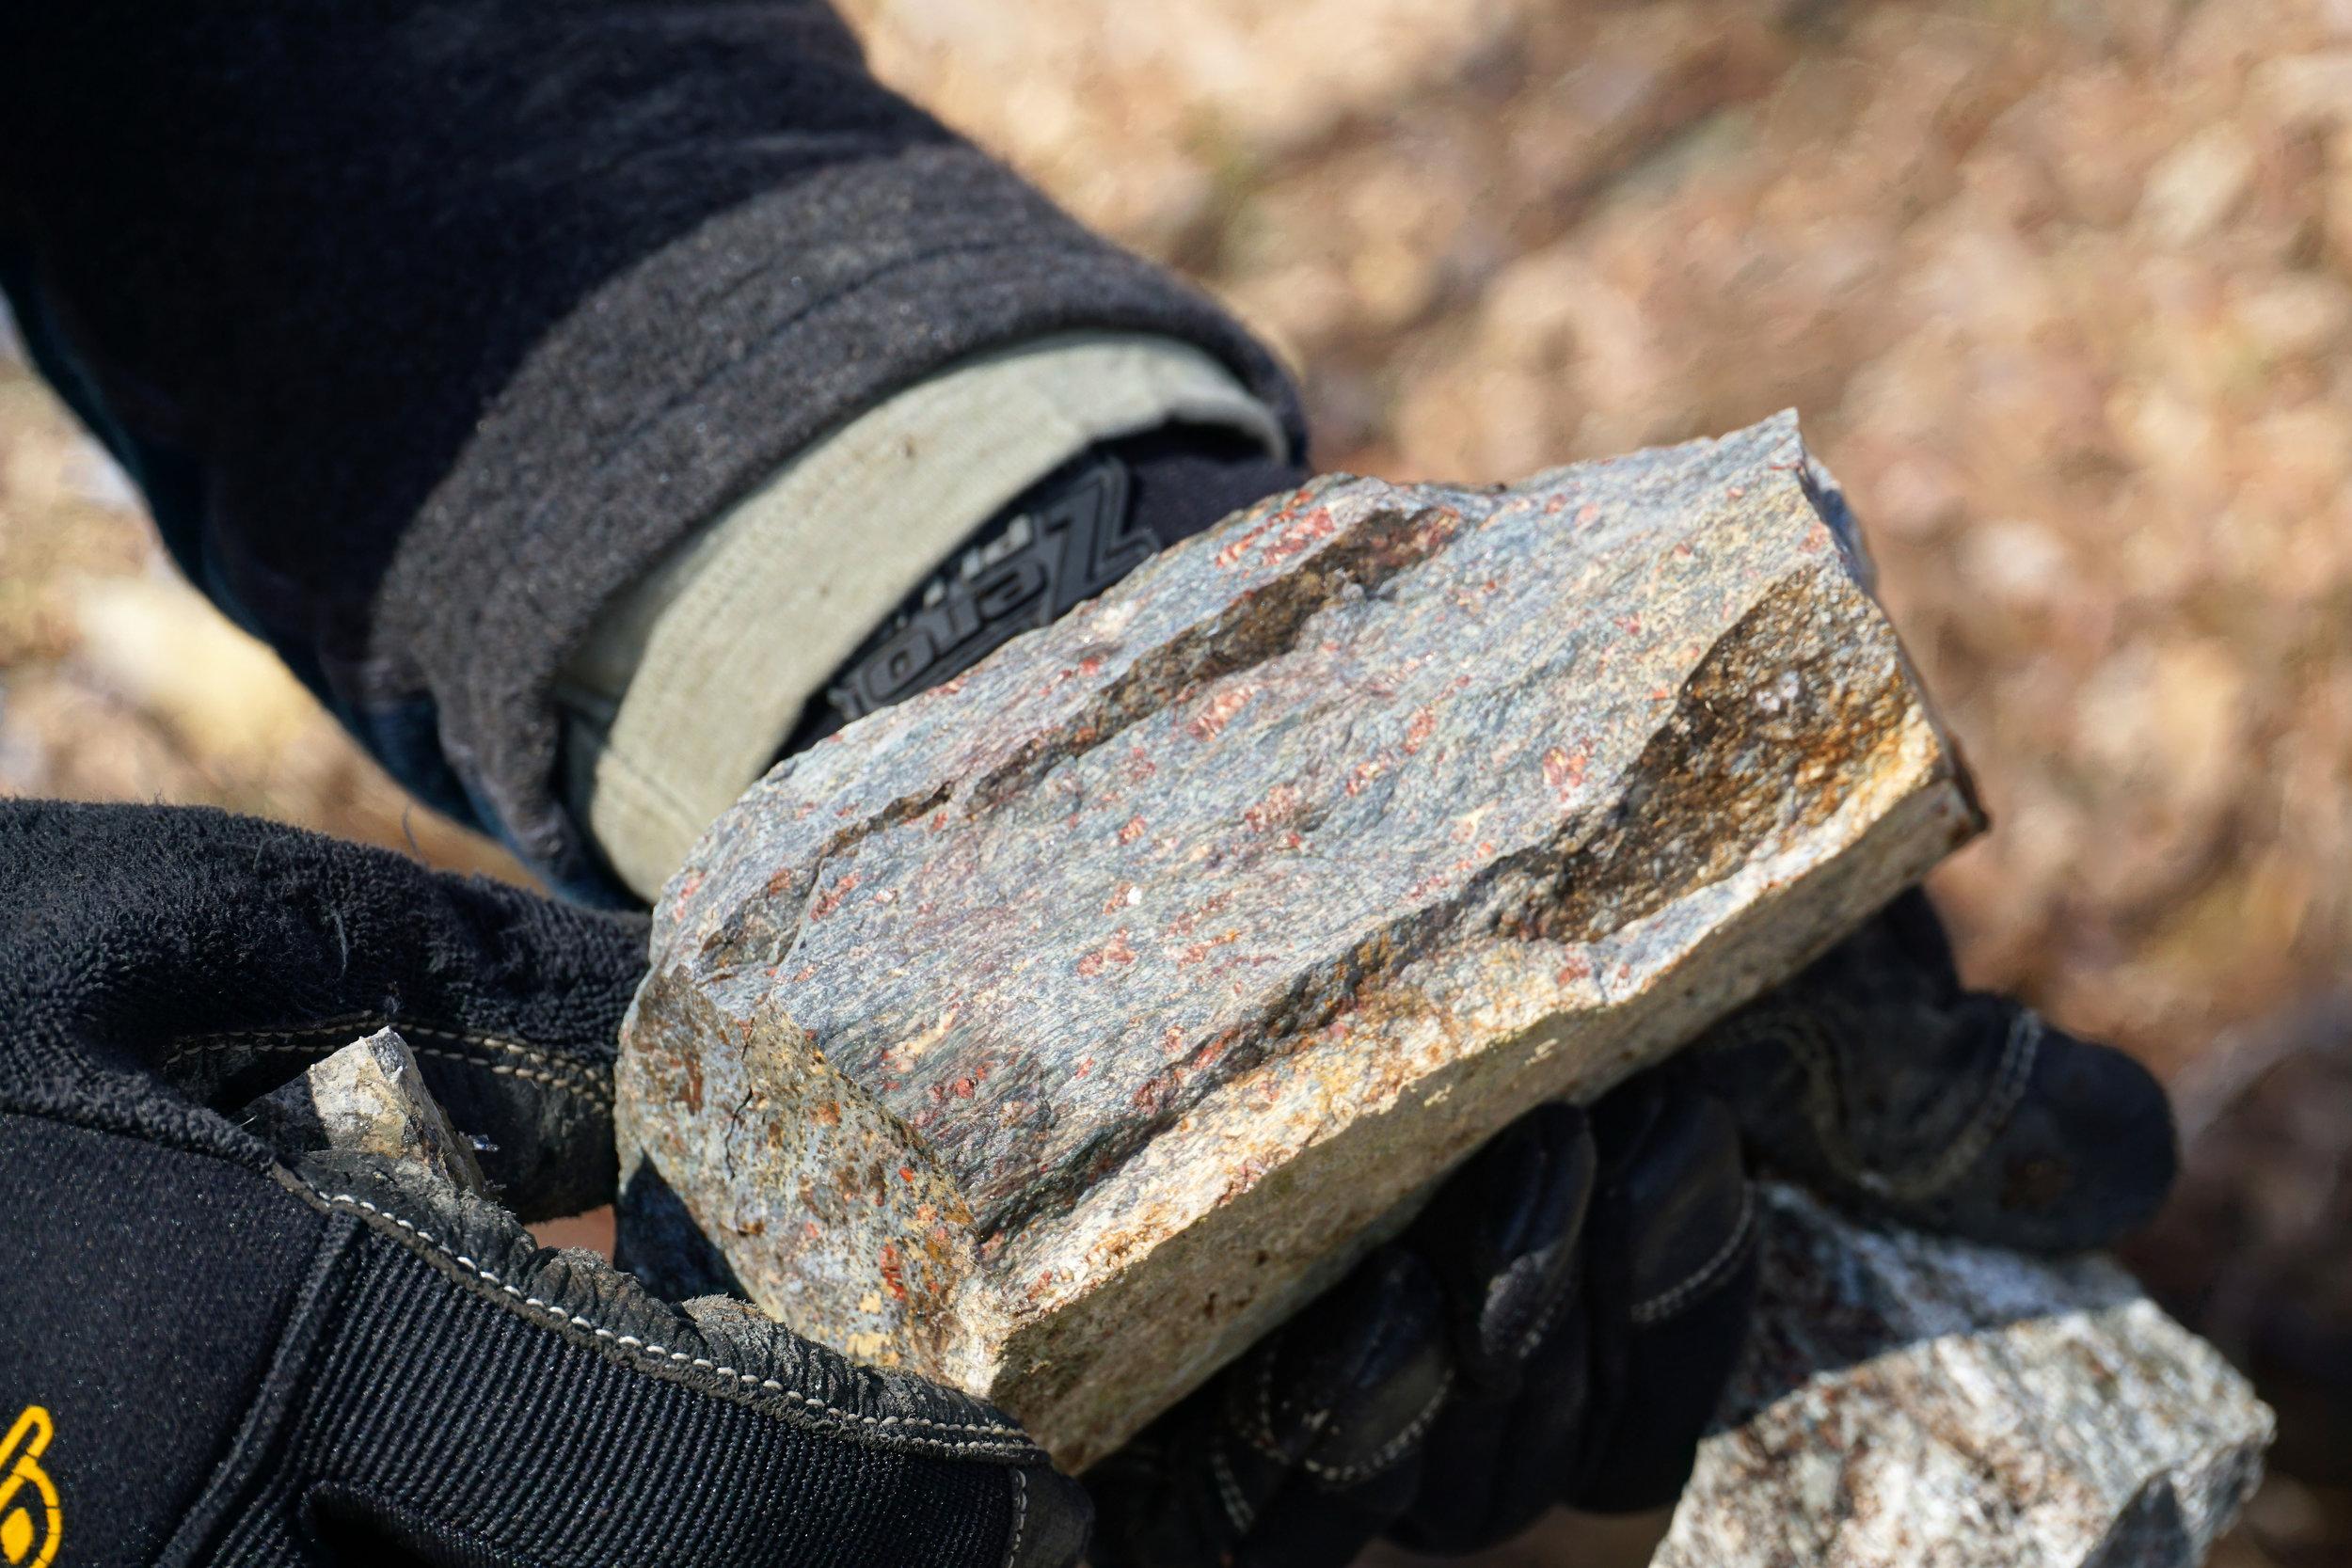 Potassium feldspar and plagioclase phenocrysts in the Buzzard Rock rhyolite.